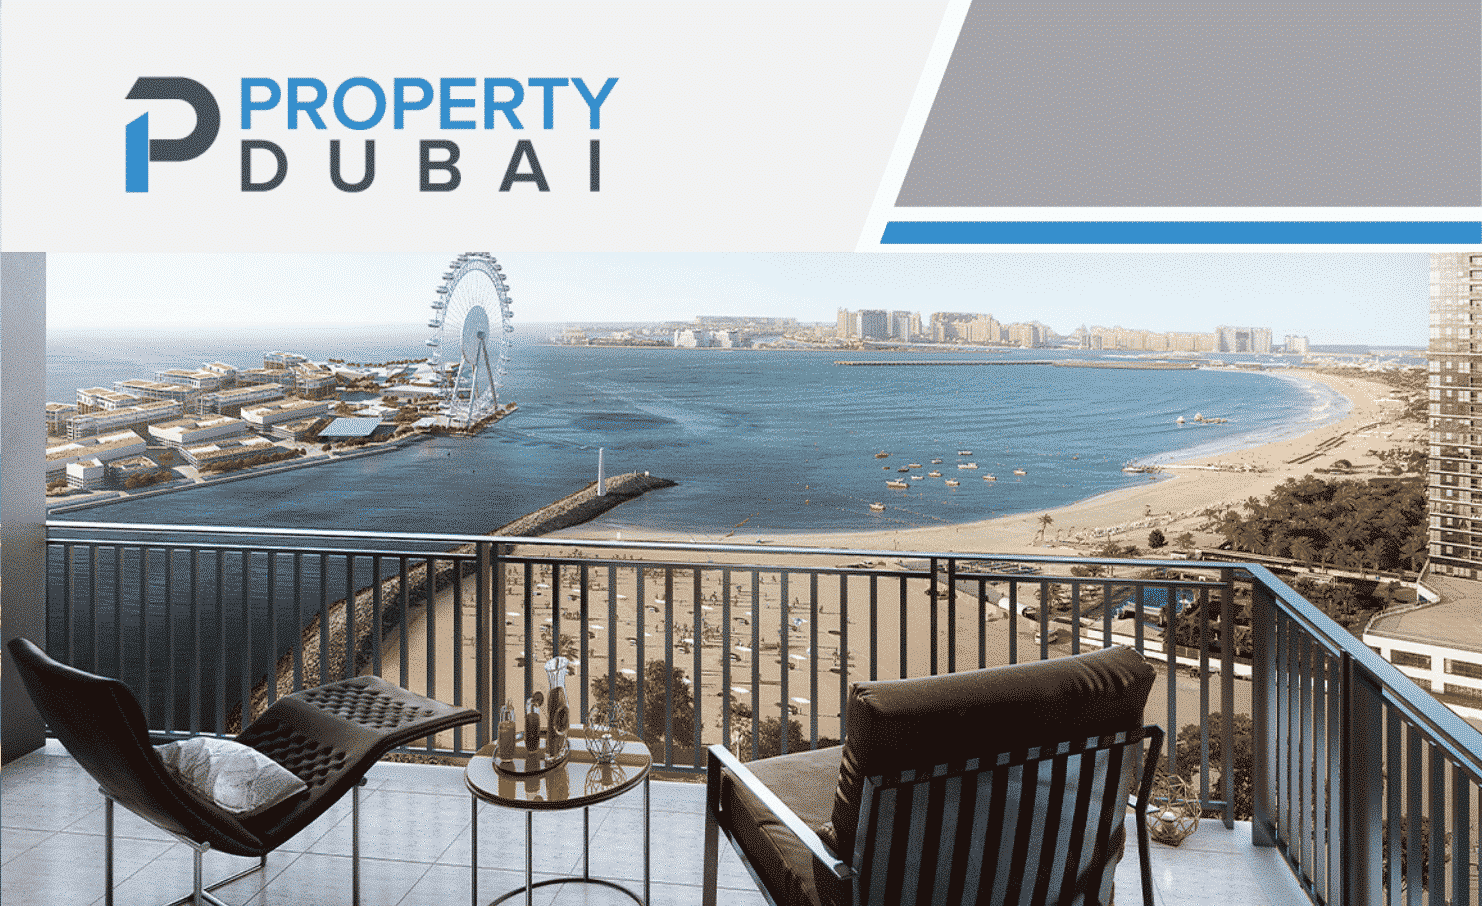 52 42 - Luxusapartments in Dubai JBR